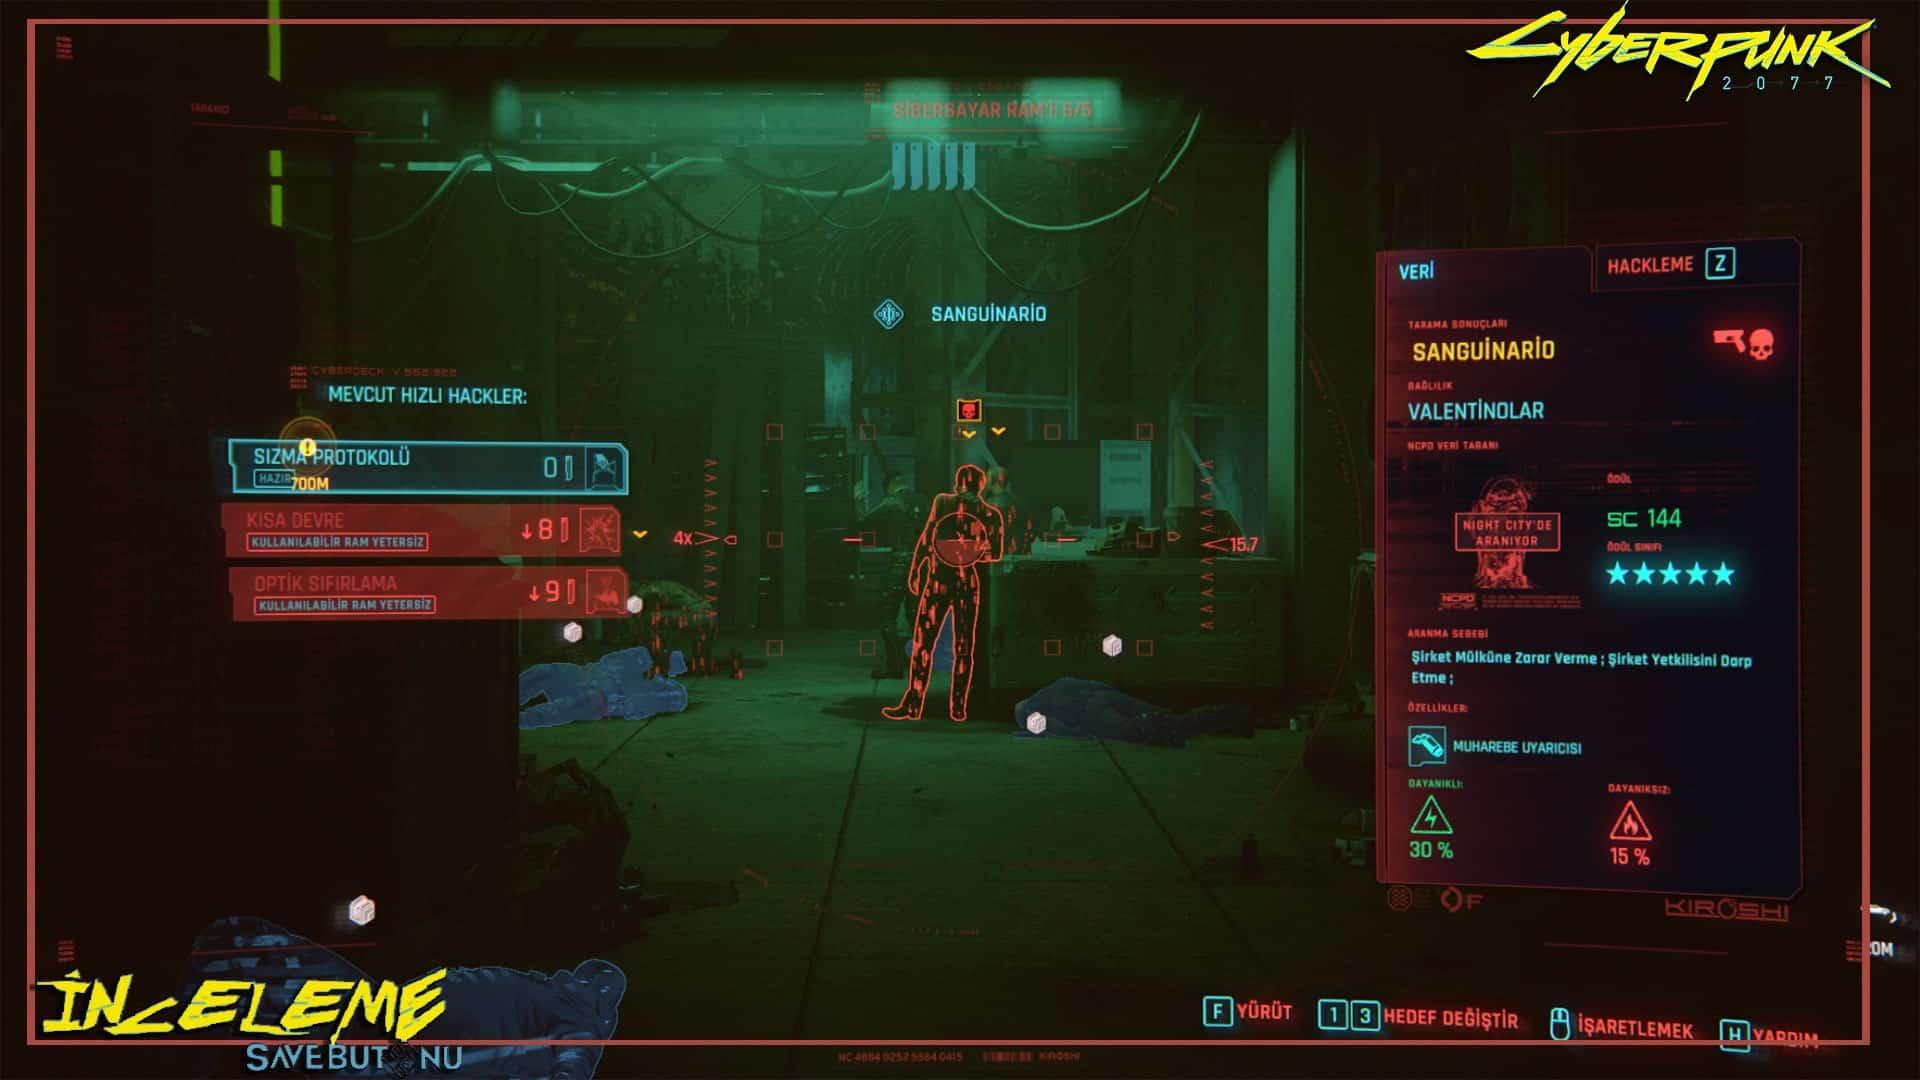 cyberpunk-hackleme